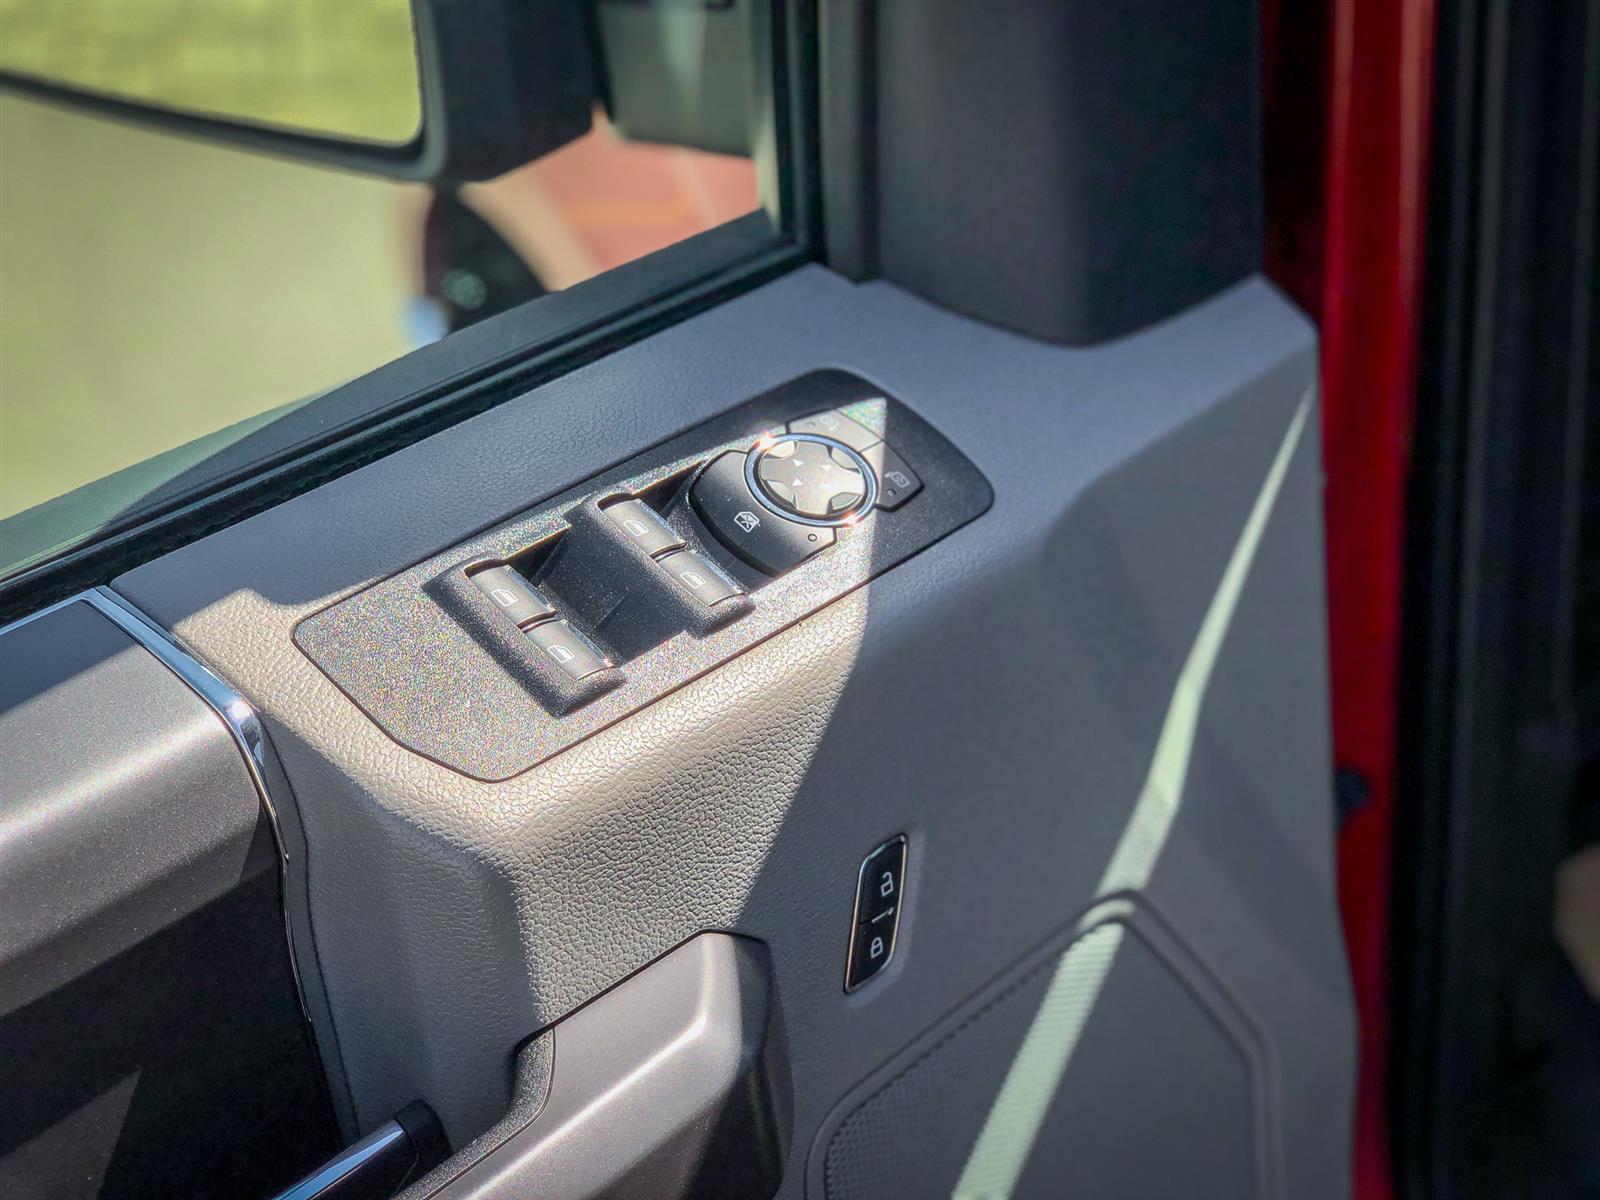 2020 Ford F-150 XLT | 3.5L V6 ECOBOOST | 4X4 | REMOTE START | TRAILER TOW PACKAG